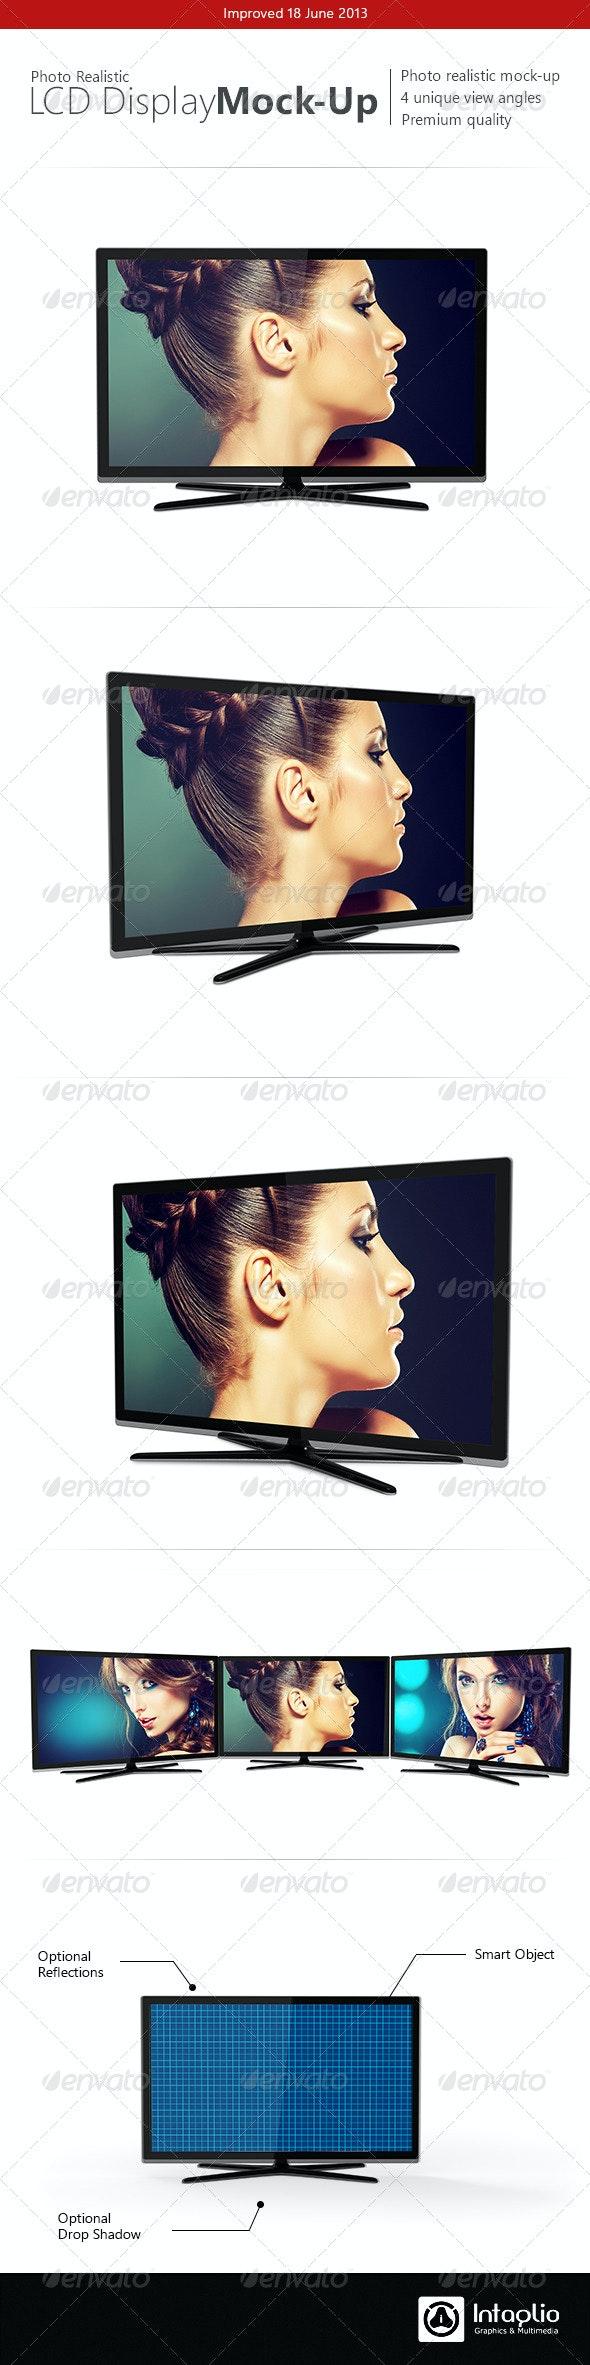 Photorealistic LCD Mock-Up - TV Displays